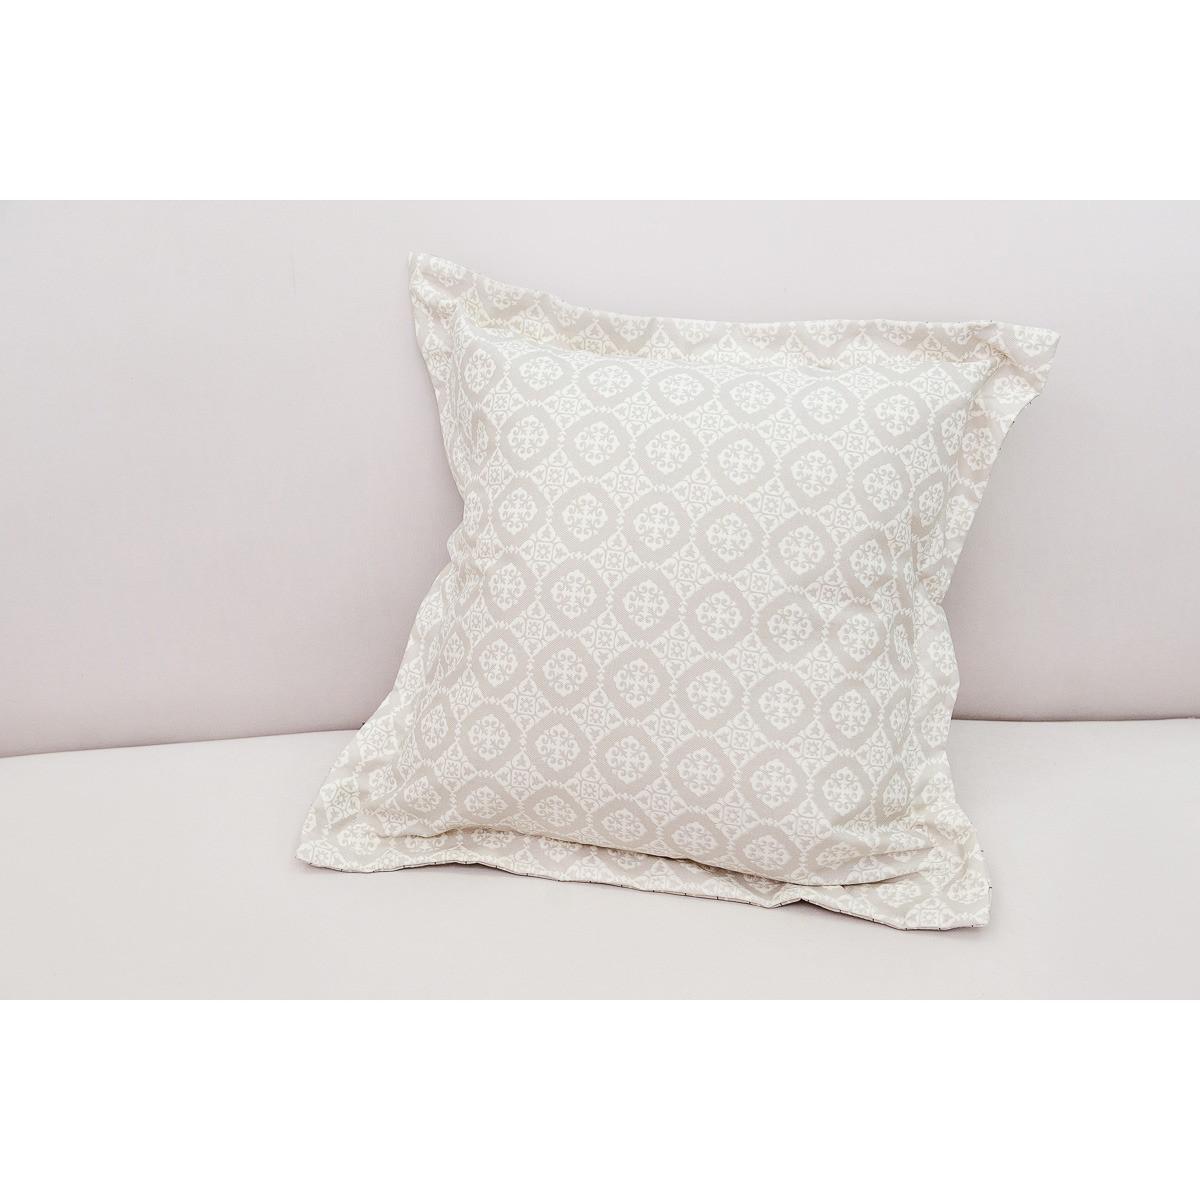 Декоративная подушка Ажур 40х40 см